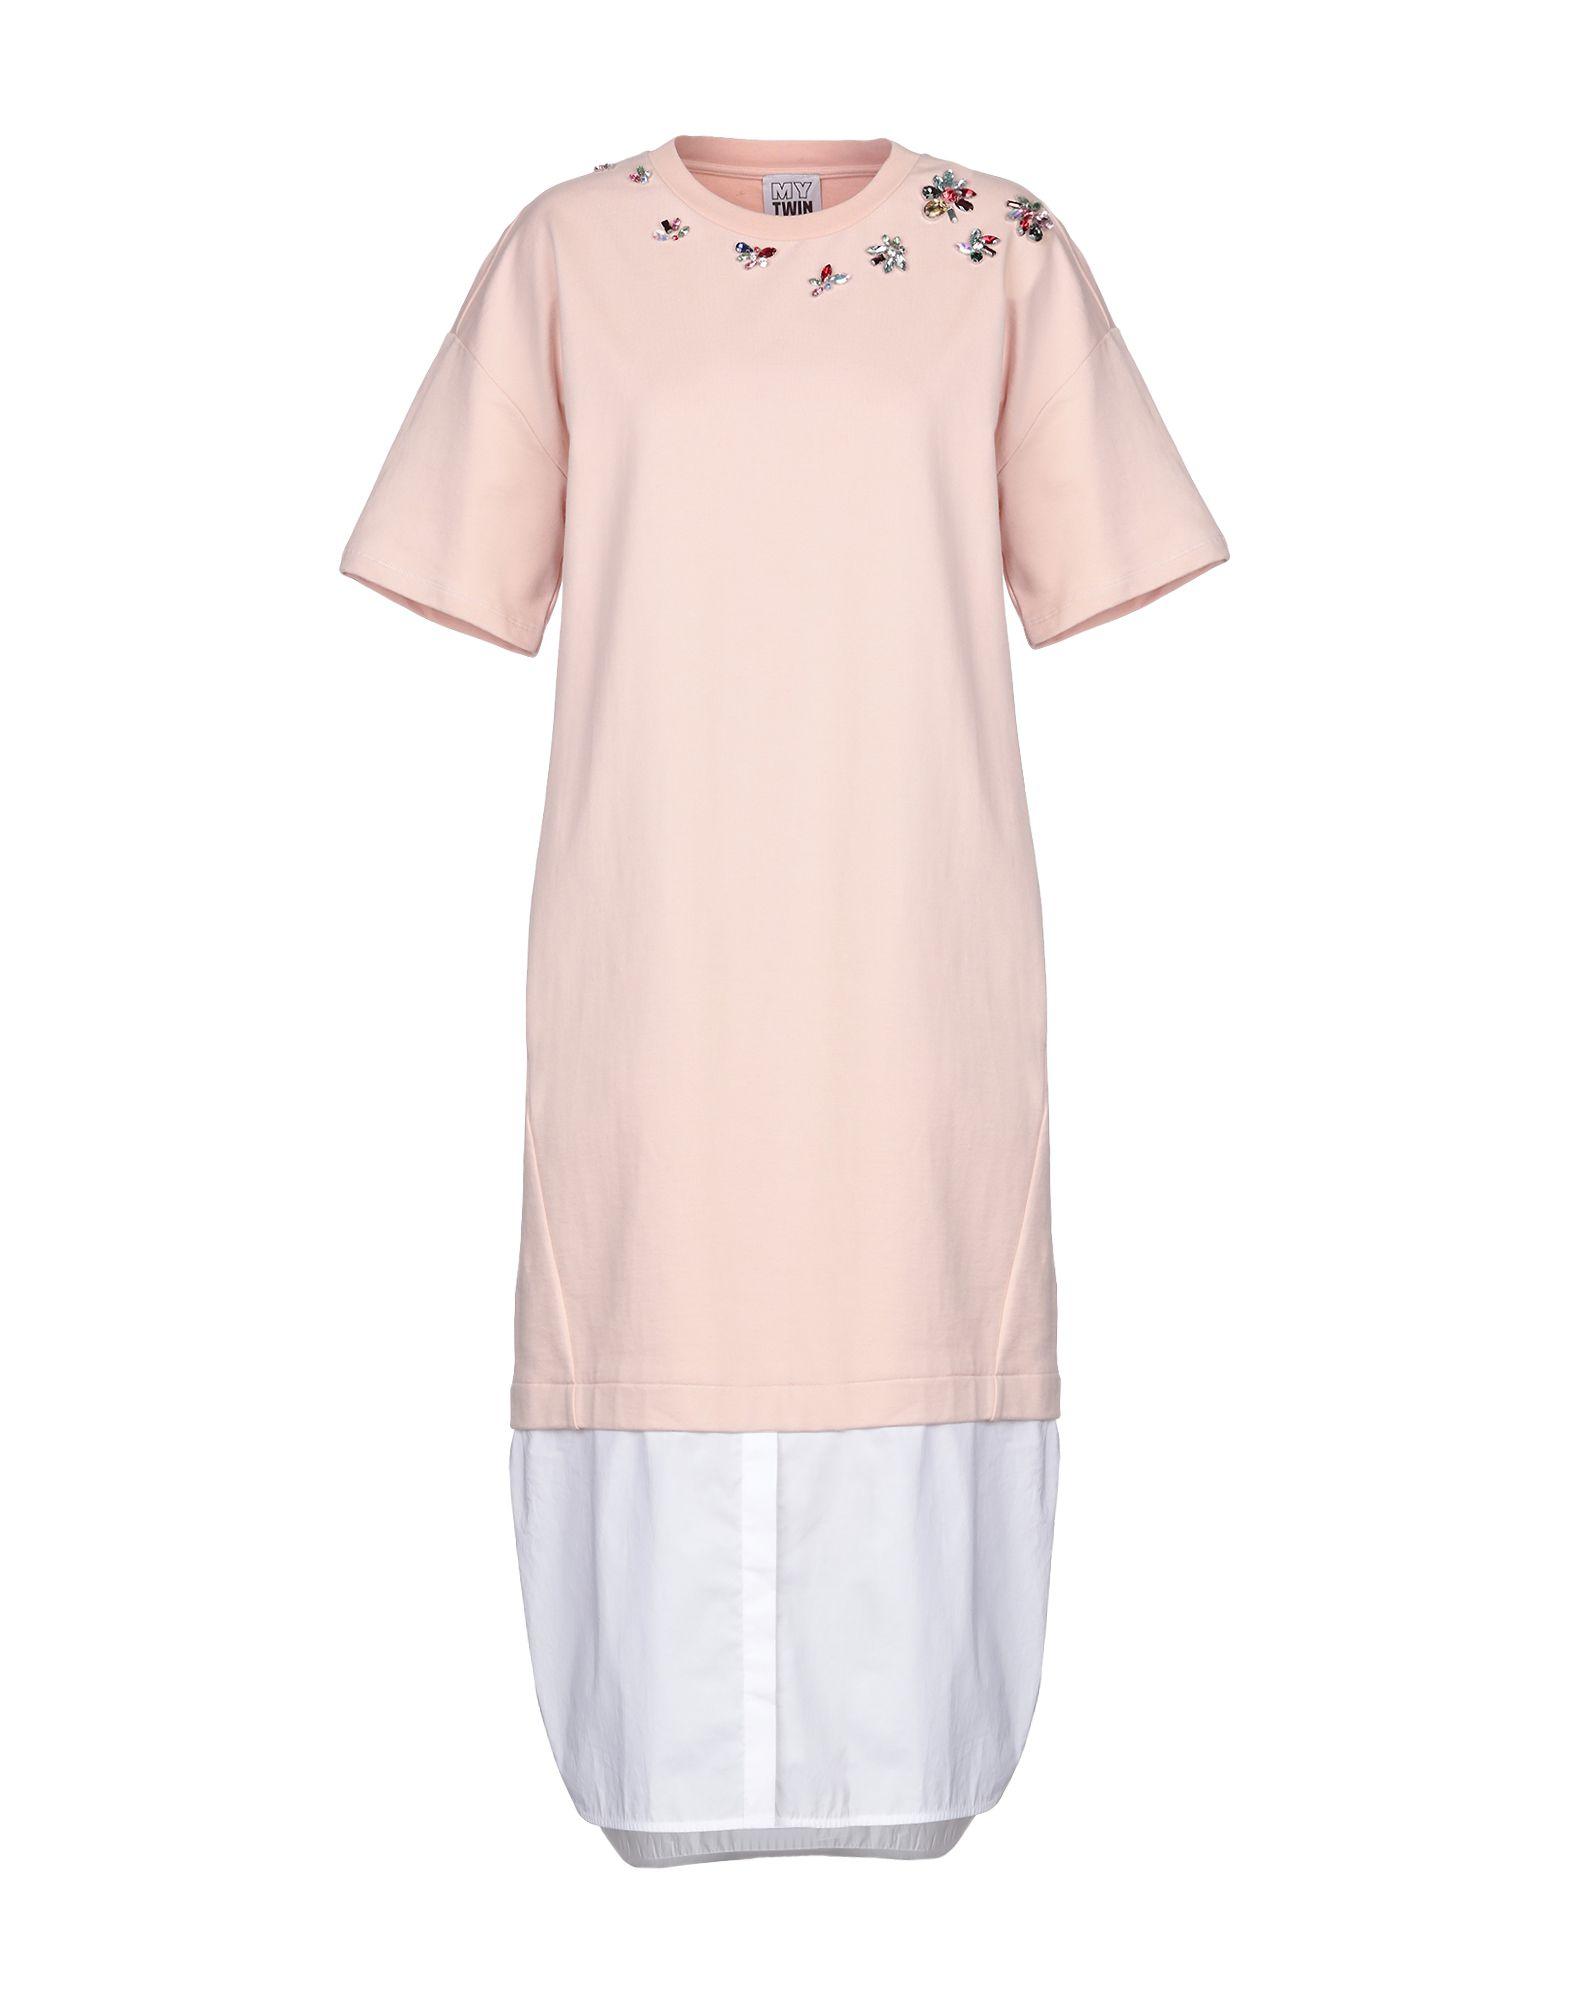 MY TWIN TWINSET Платье длиной 3/4 платье quelle my style 1003975 page 4